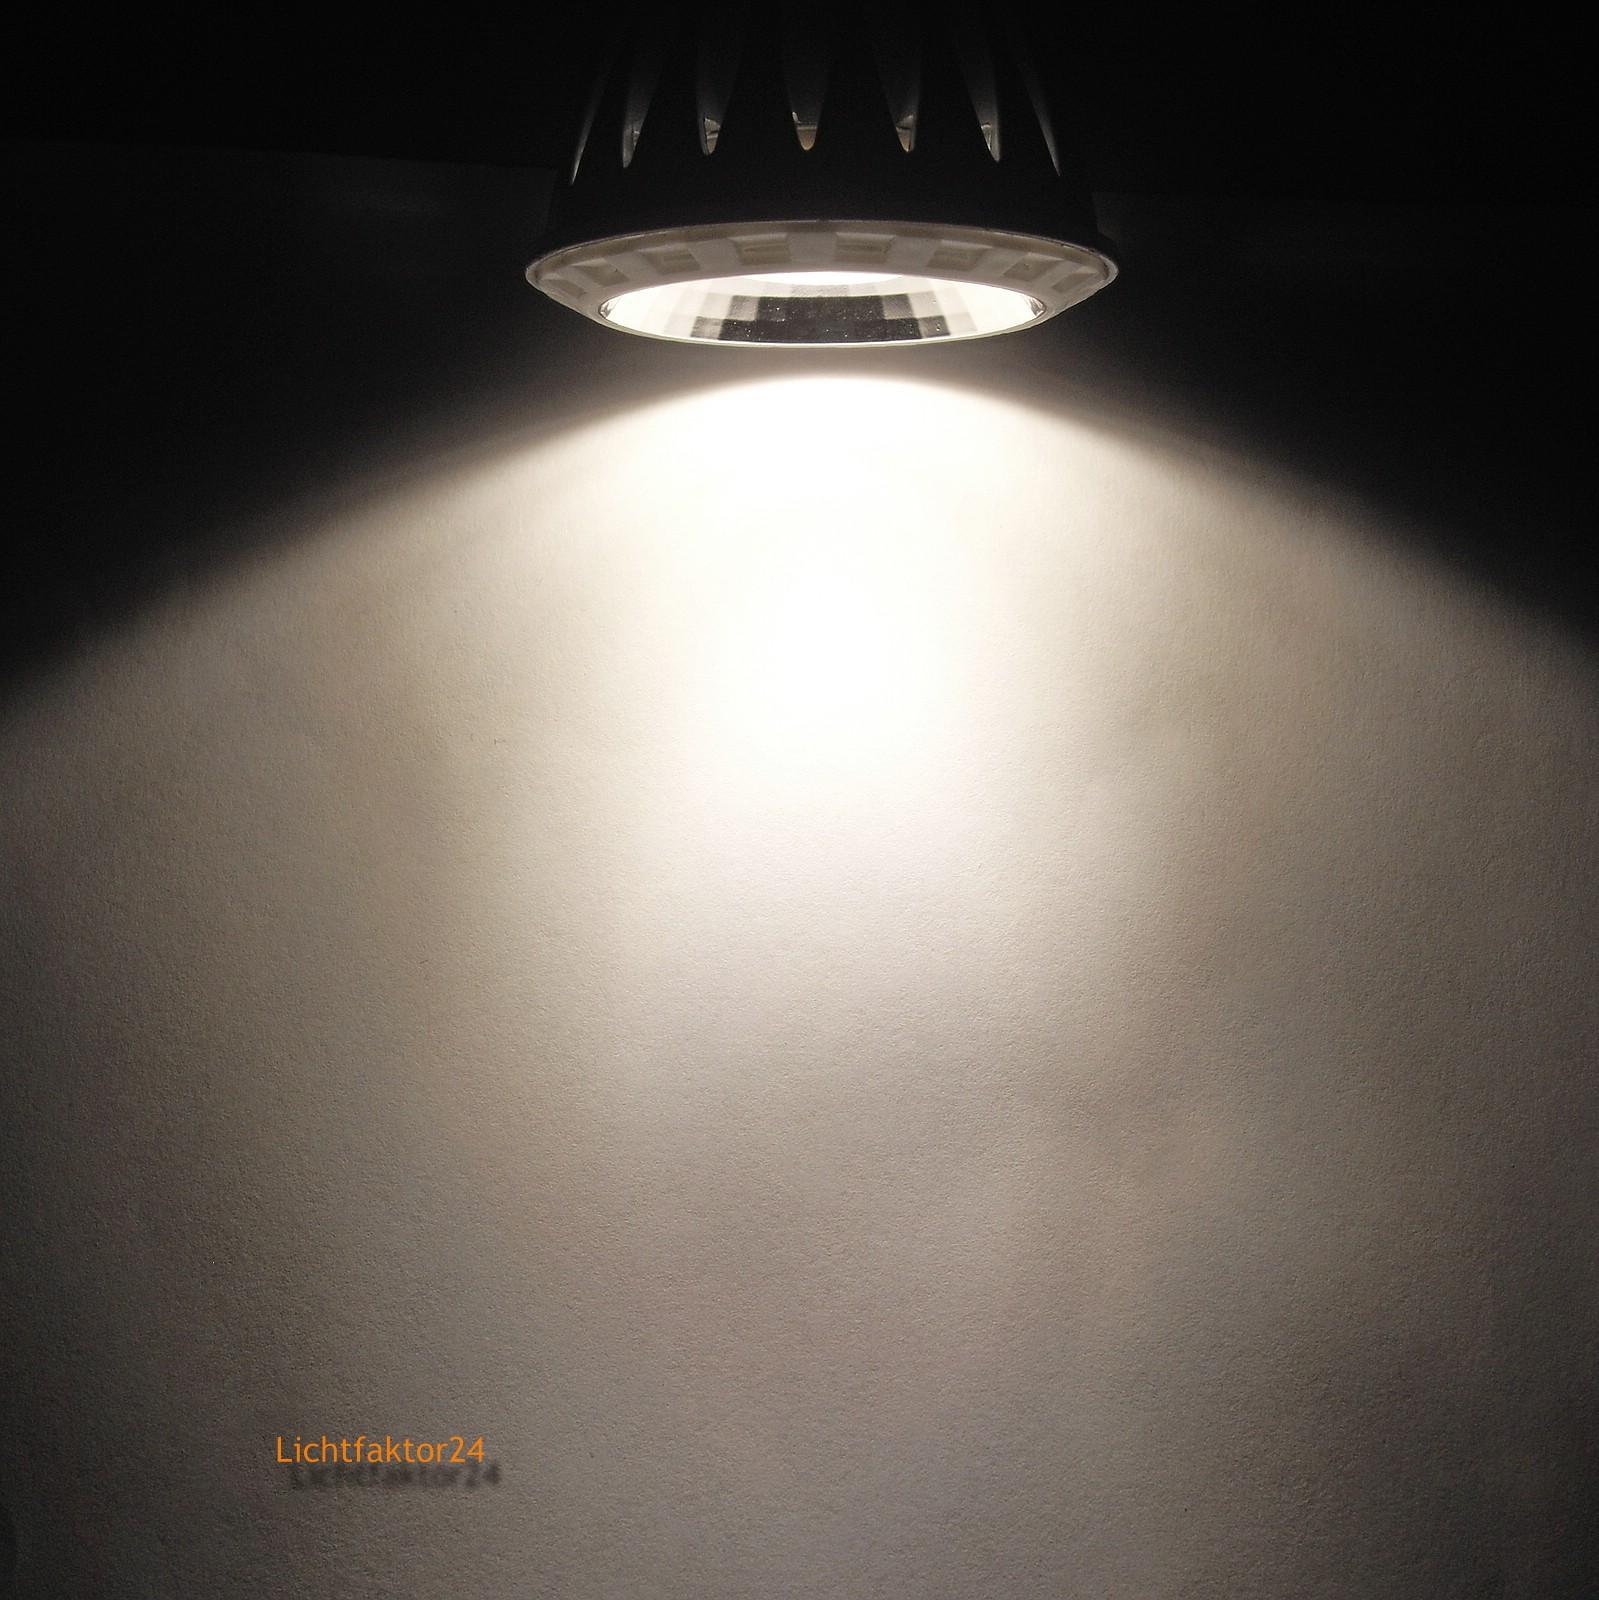 LED-Deckenleuchte-Dimmbar-Hochvolt-Einbauspots-mit-COB-Reflektor-Power-LED-Lampe